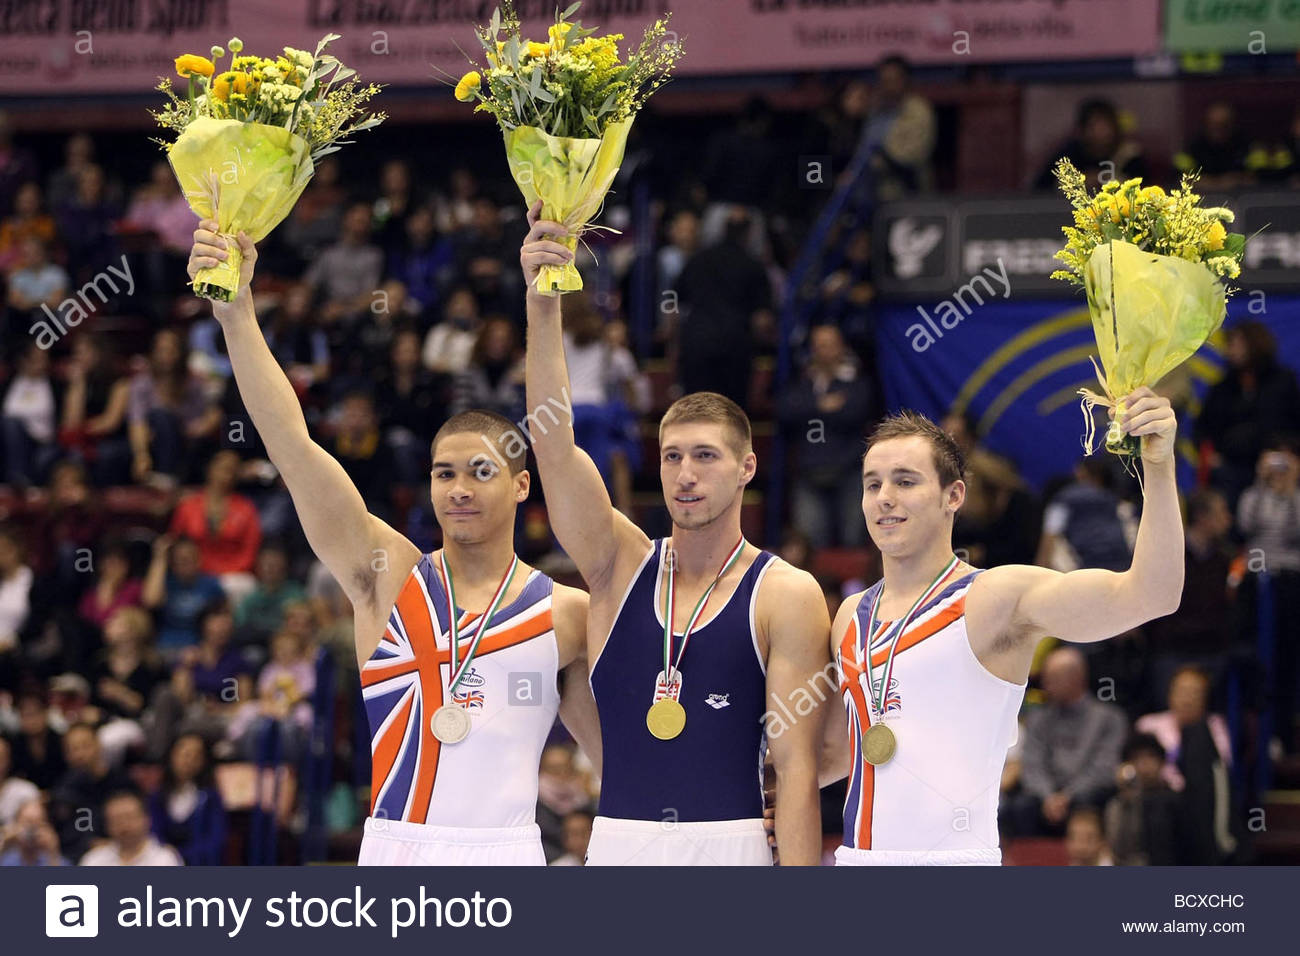 luis smith, kristian berki, daniel keatings, milano 2009, europeanartisticgymnasticchampionships Stock Photo